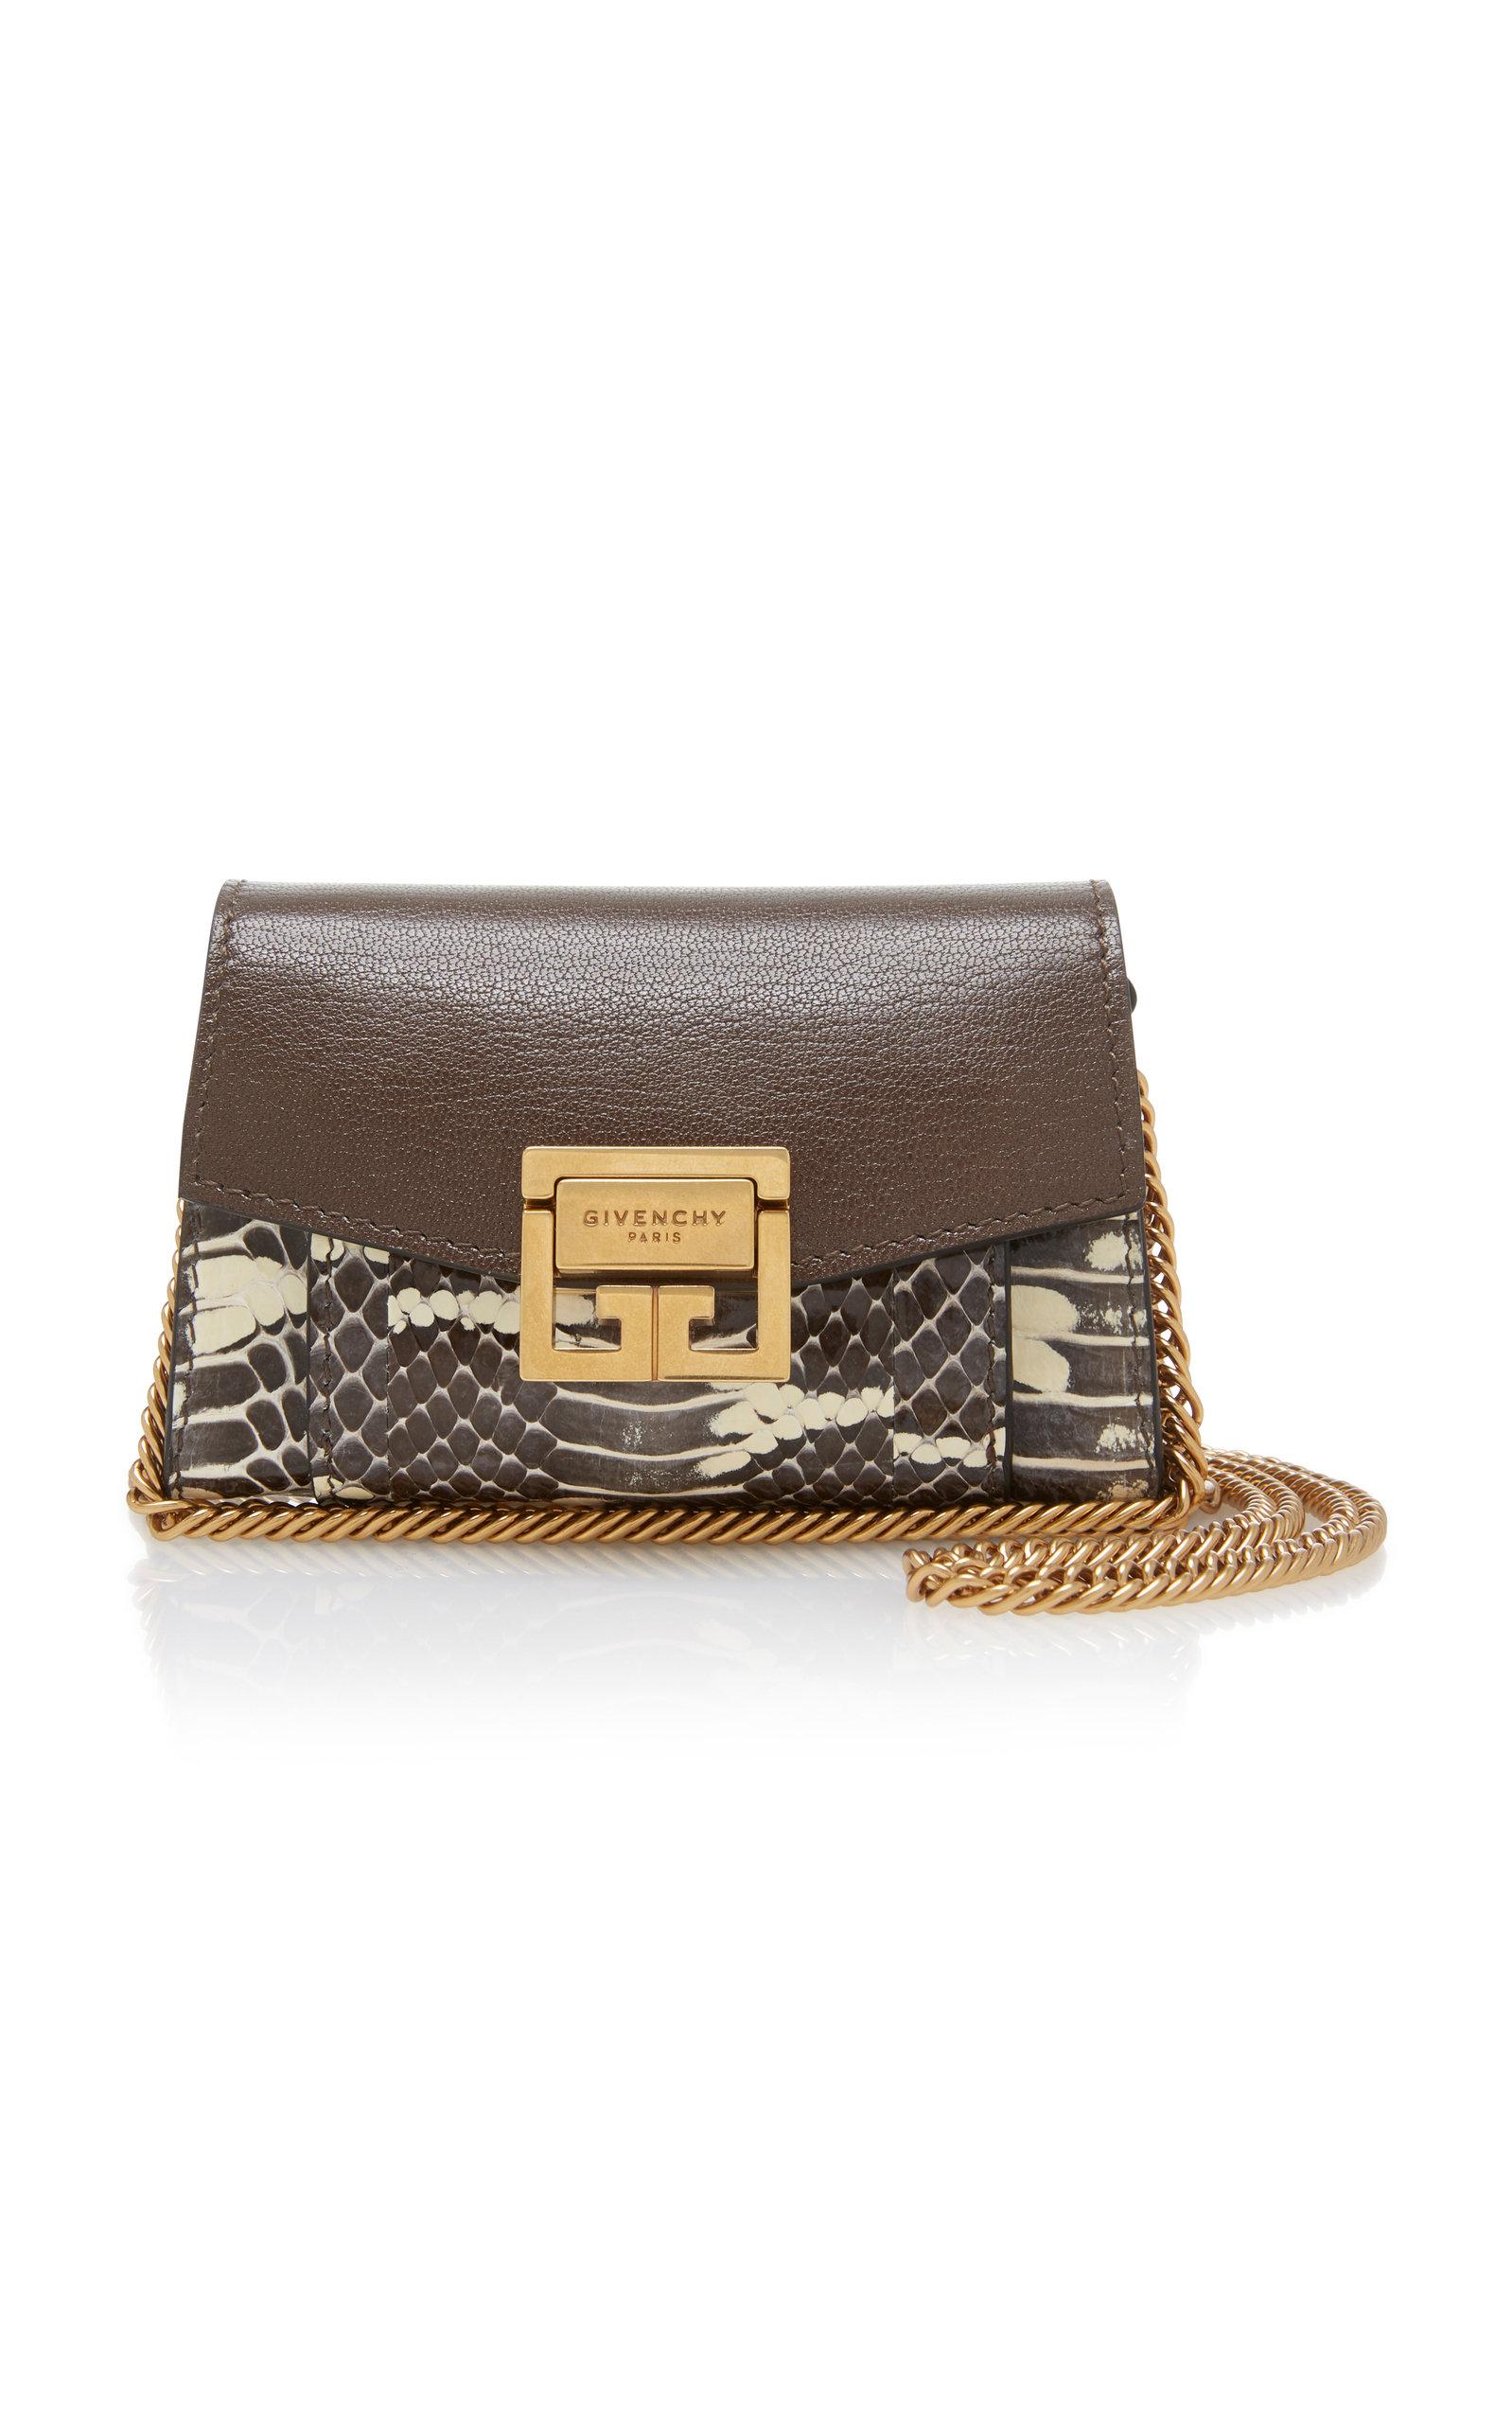 Givenchy GV3 Nano Elaphe And Leather Shoulder Bag vAfEOyR